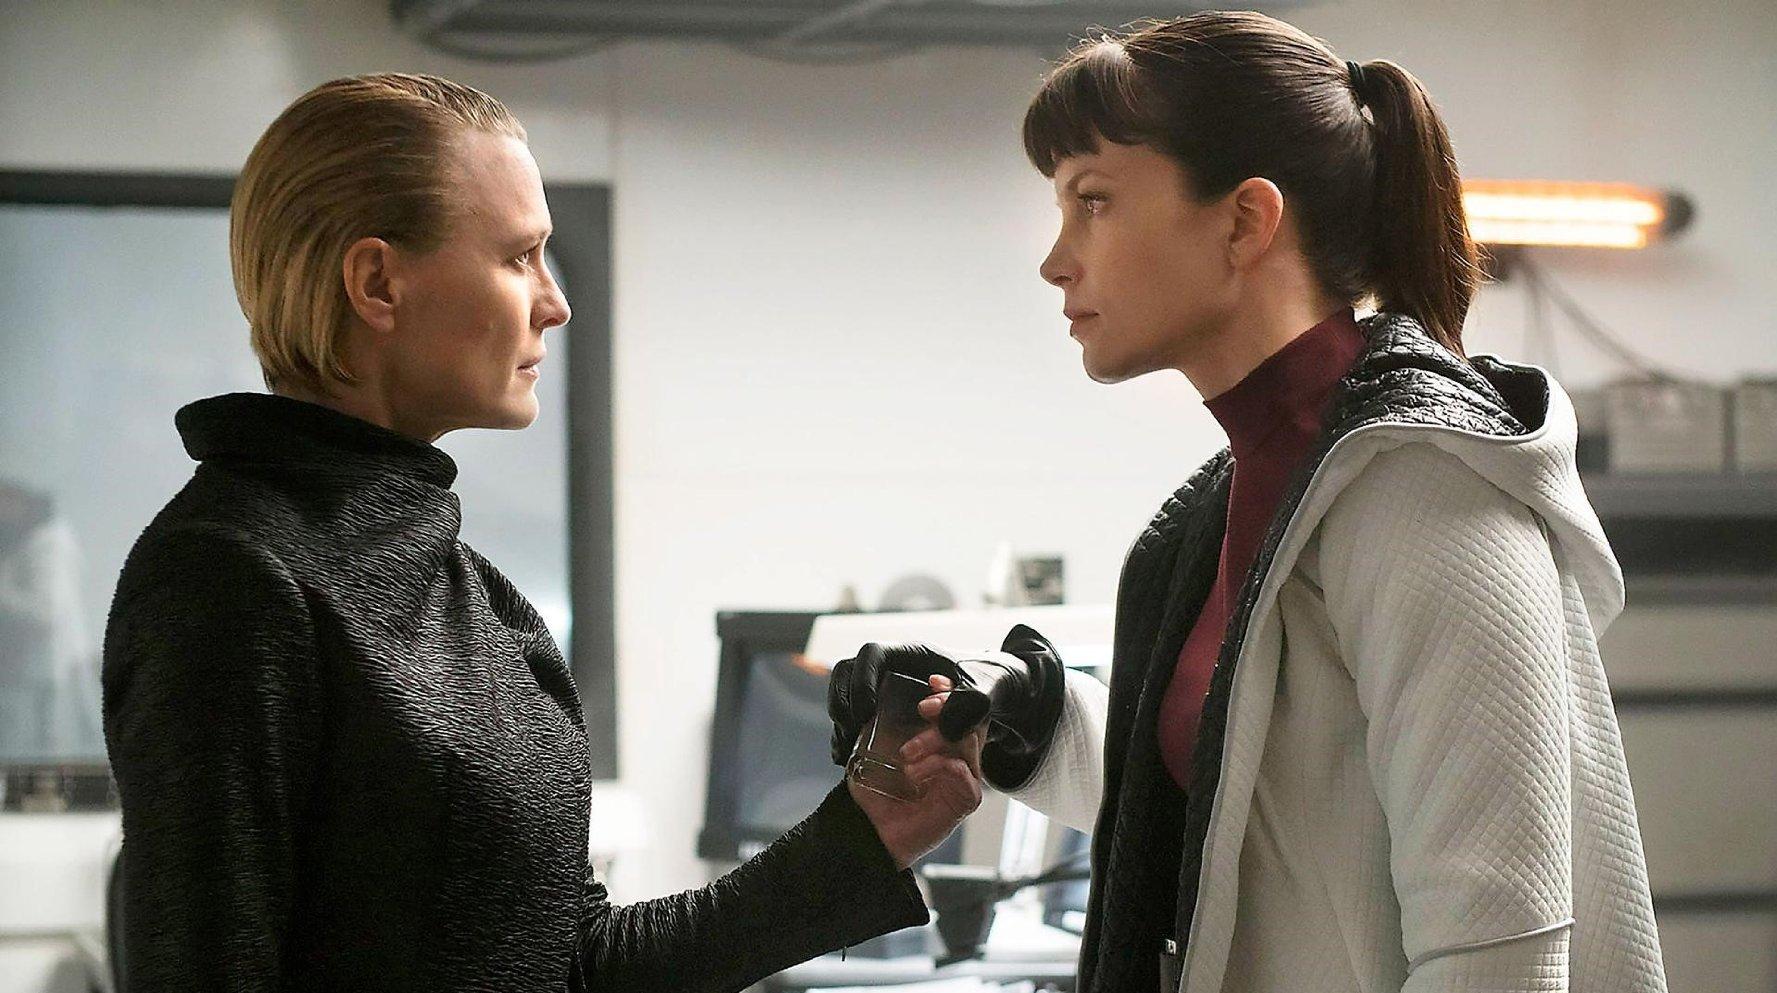 Sylvia Hoeks and robin Wright in Blade Runner 2049